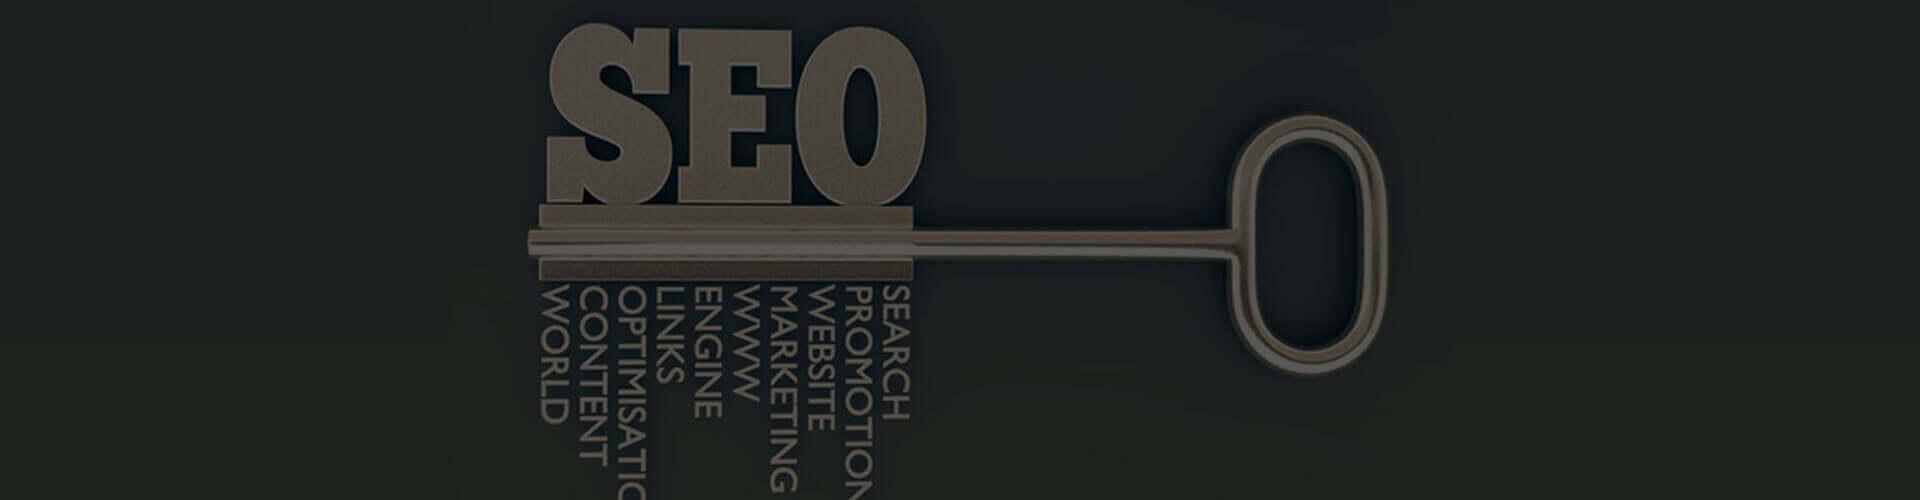 SEO Translation Expert, Outsource SEO Translation Services ...